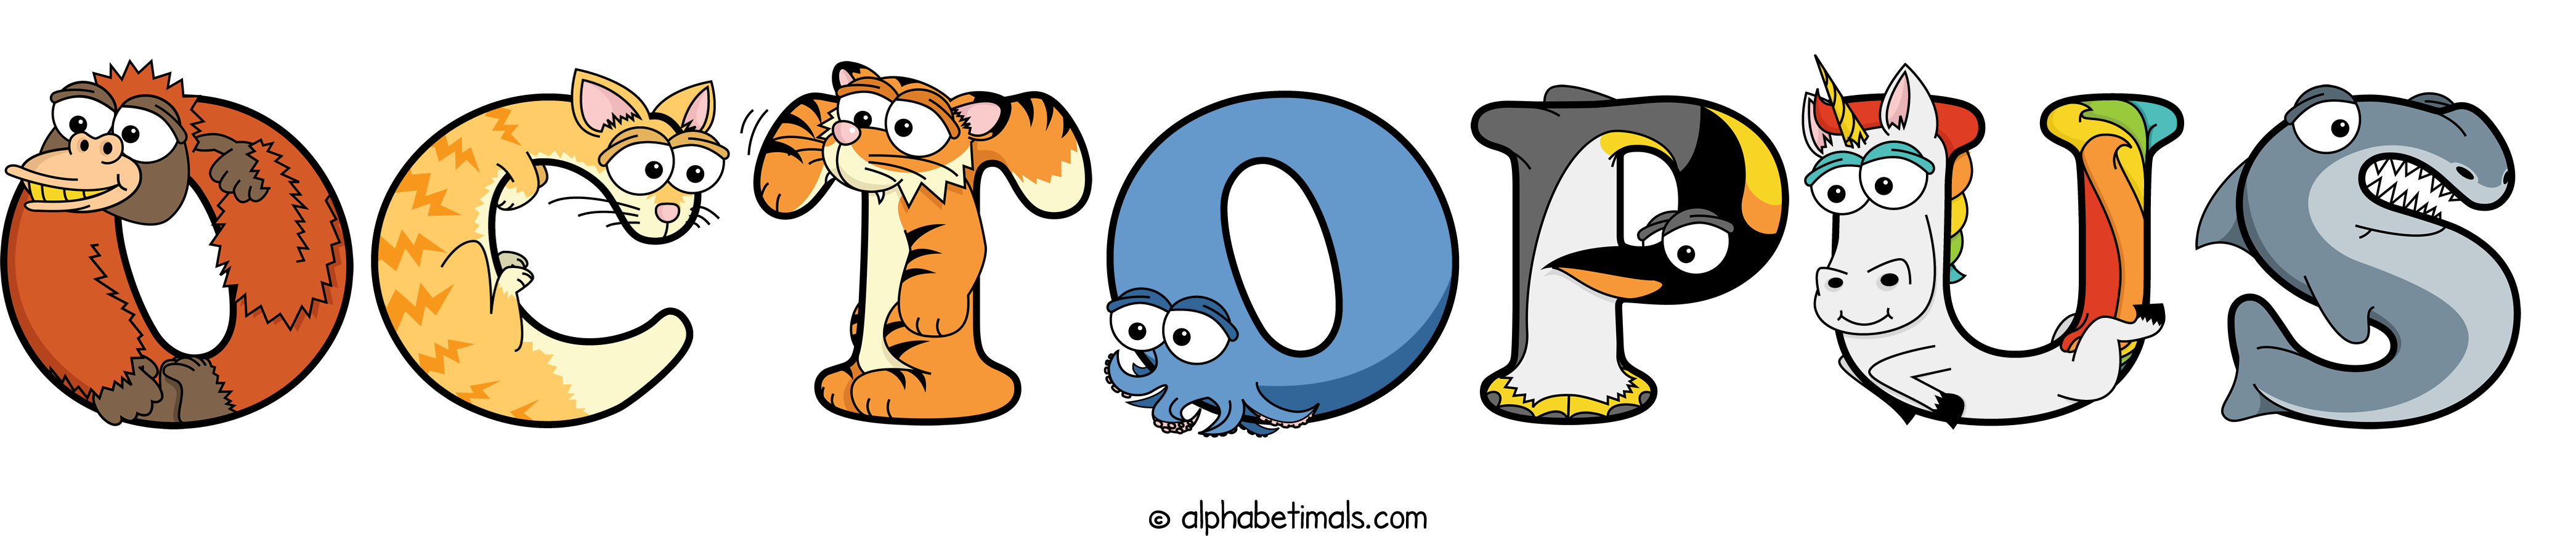 The word OCTOPUS written in cute cartoon animal drawings